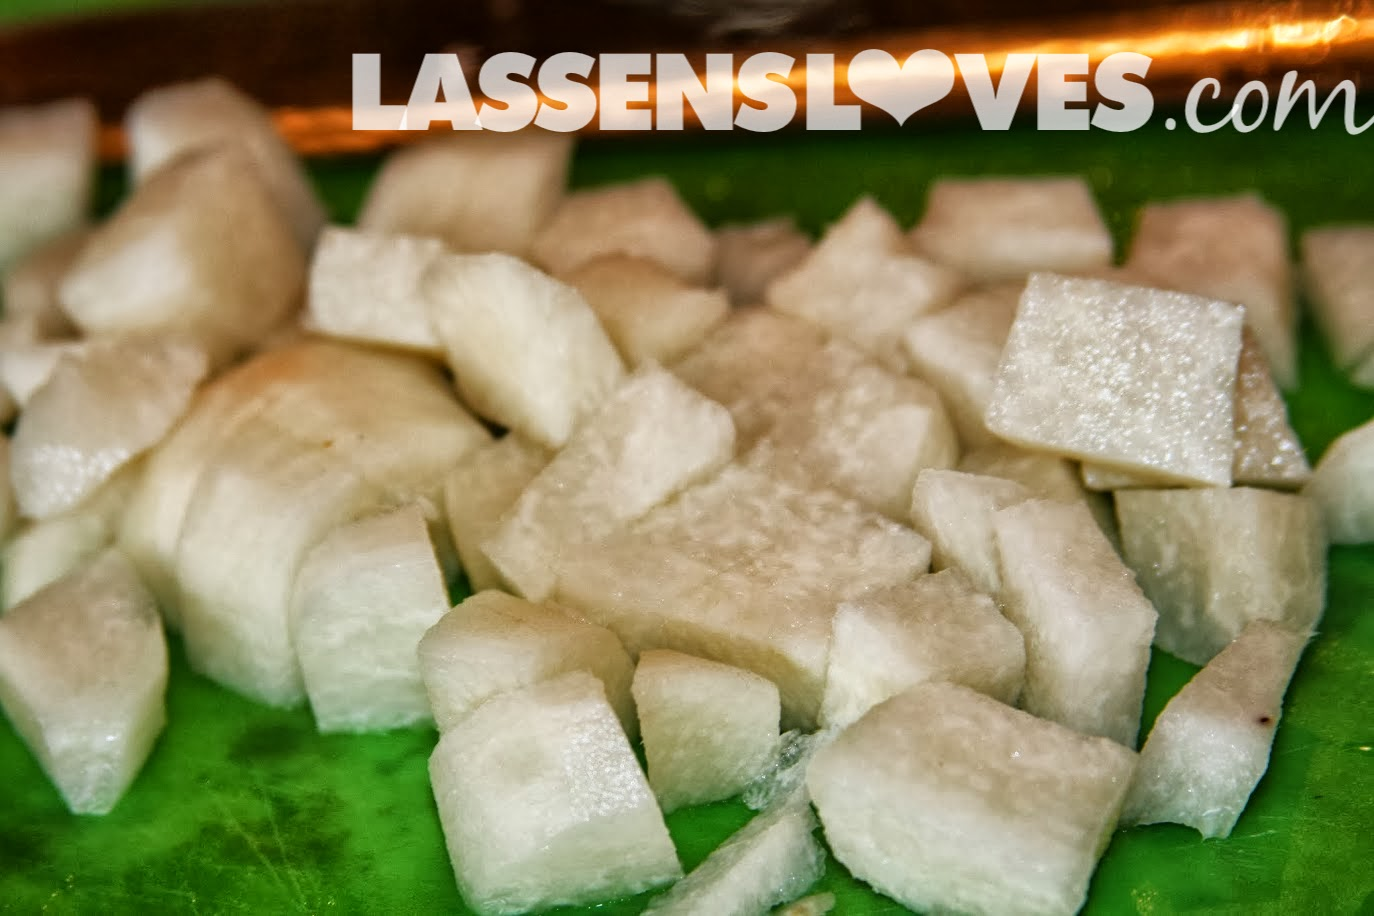 organic+jicama, Lassen's, lassensloves.com, jicama+recipe